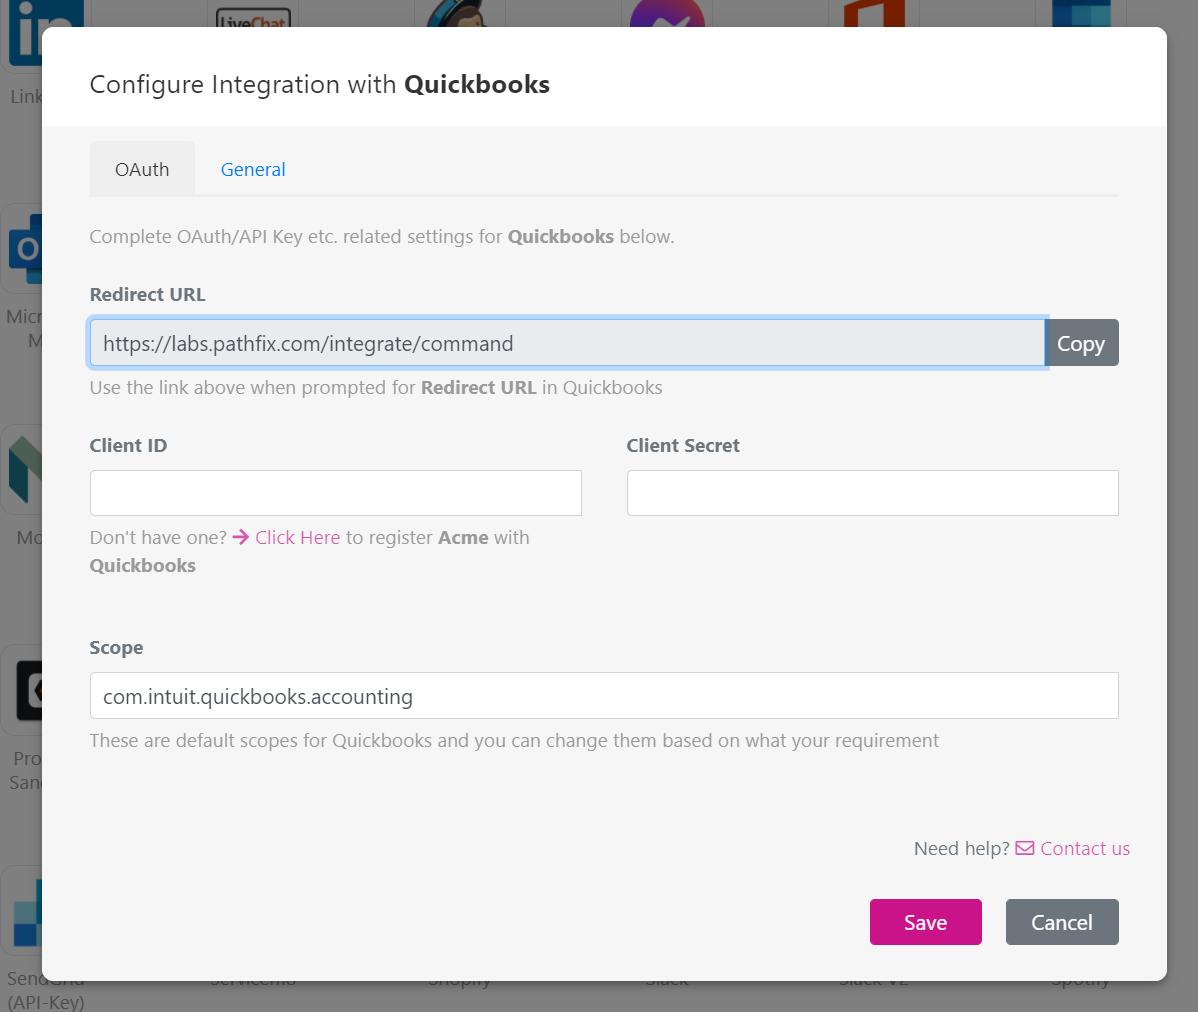 Image: Configure